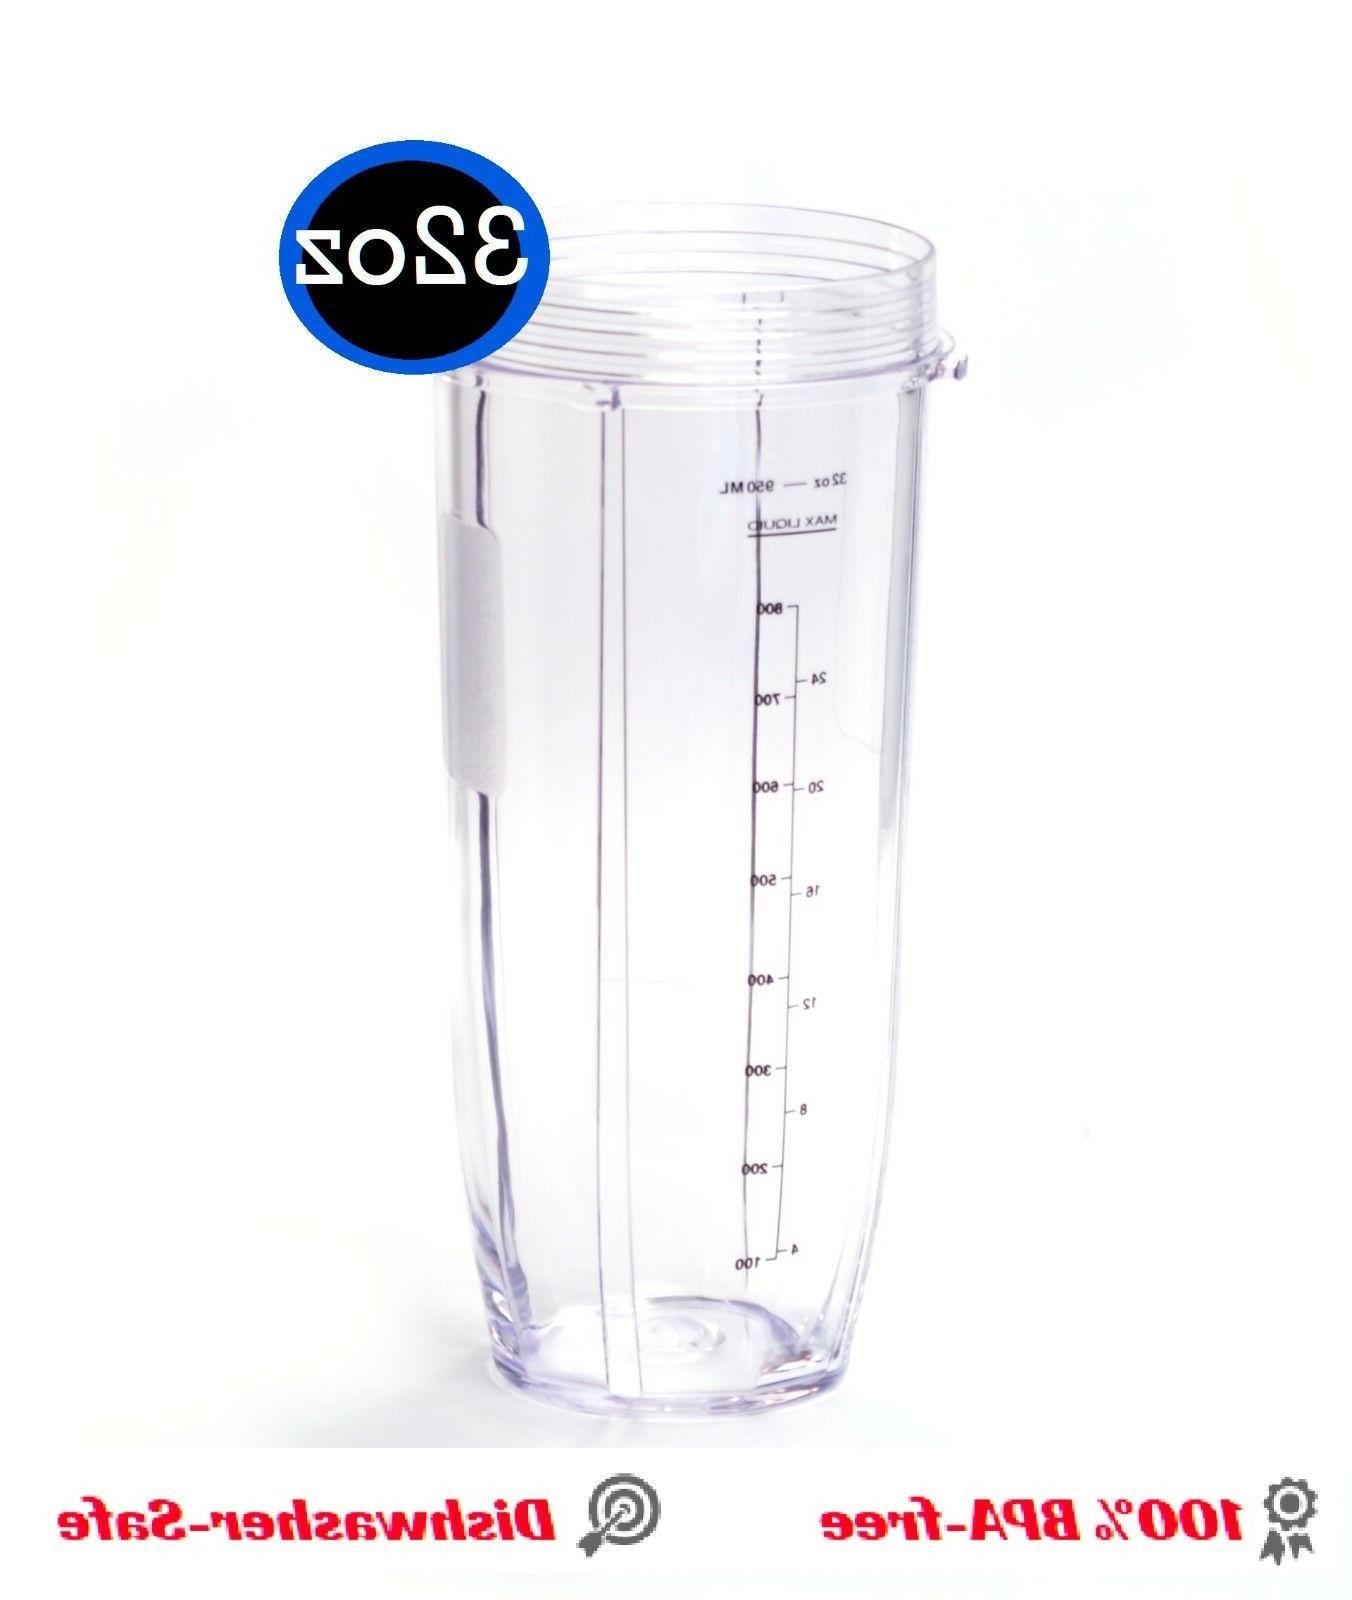 Nutri Ninja 32 Oz. Large Mixing Cup Premium Replacement Part